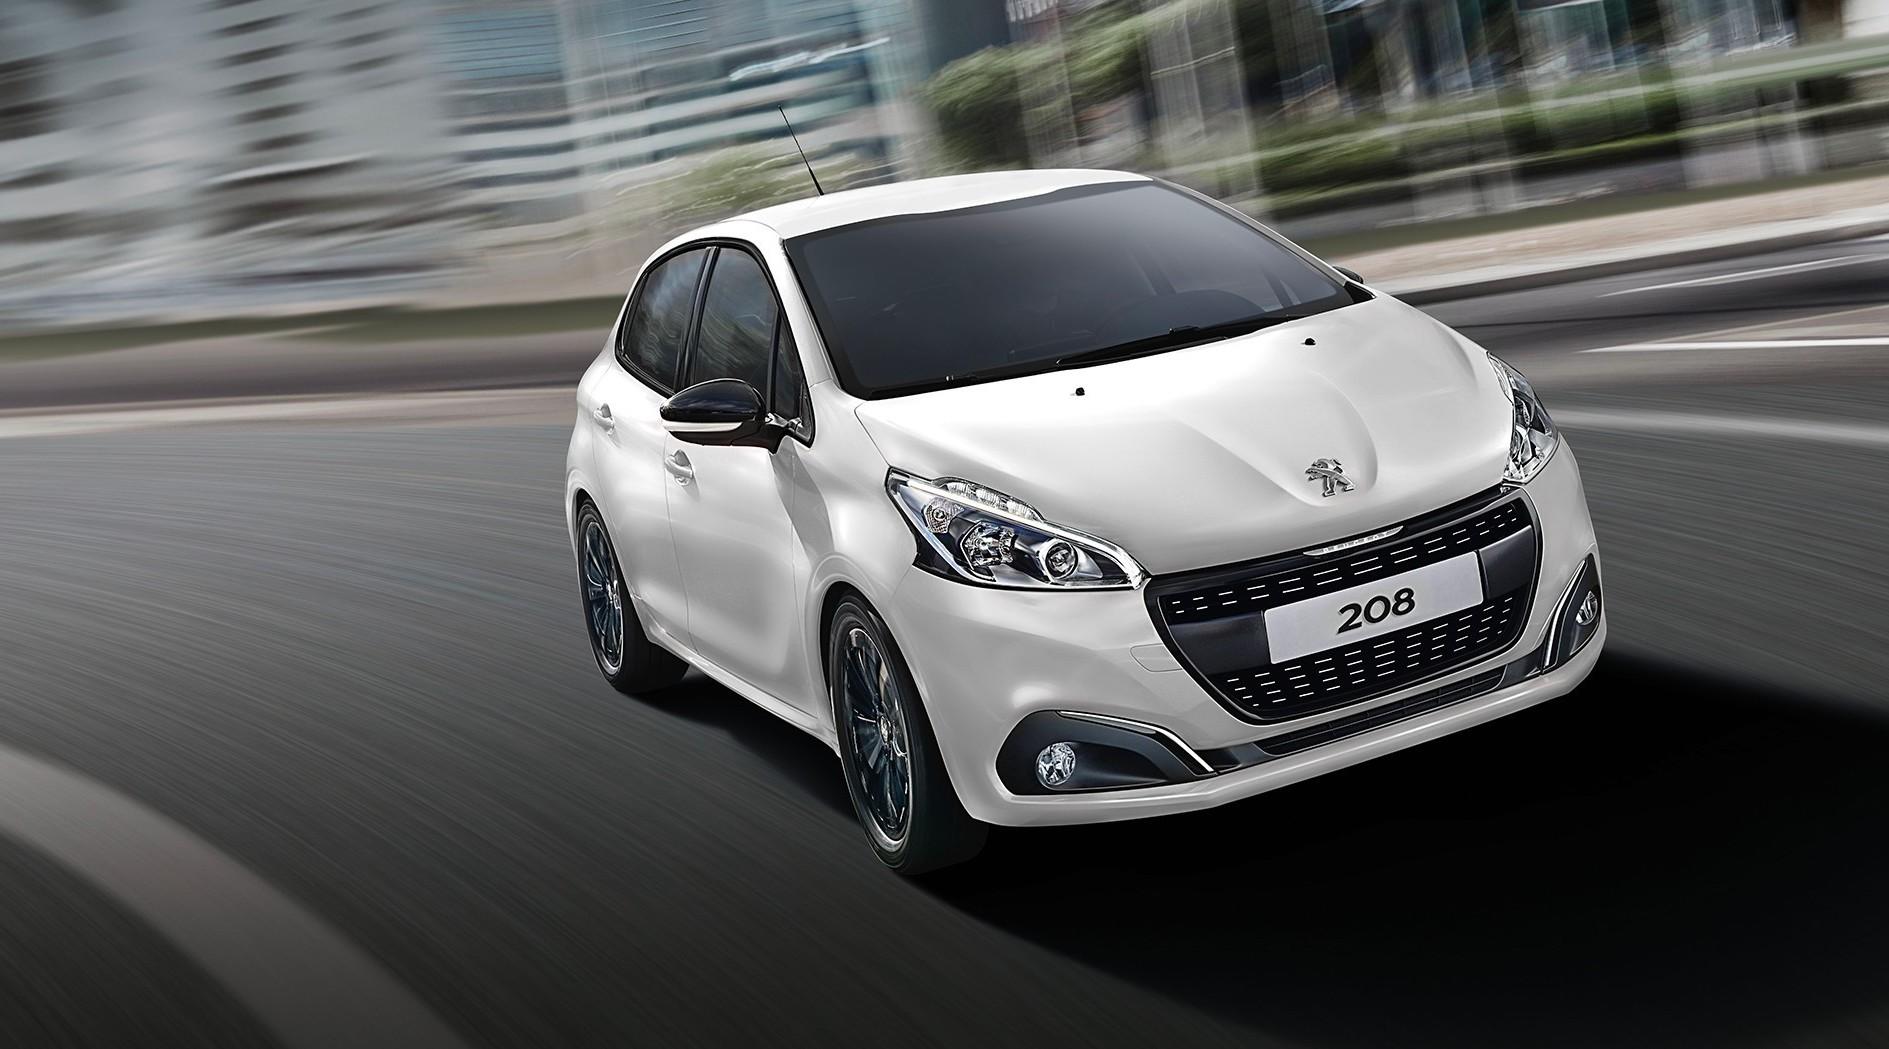 Peugeot 208 elettrica, benzina o diesel